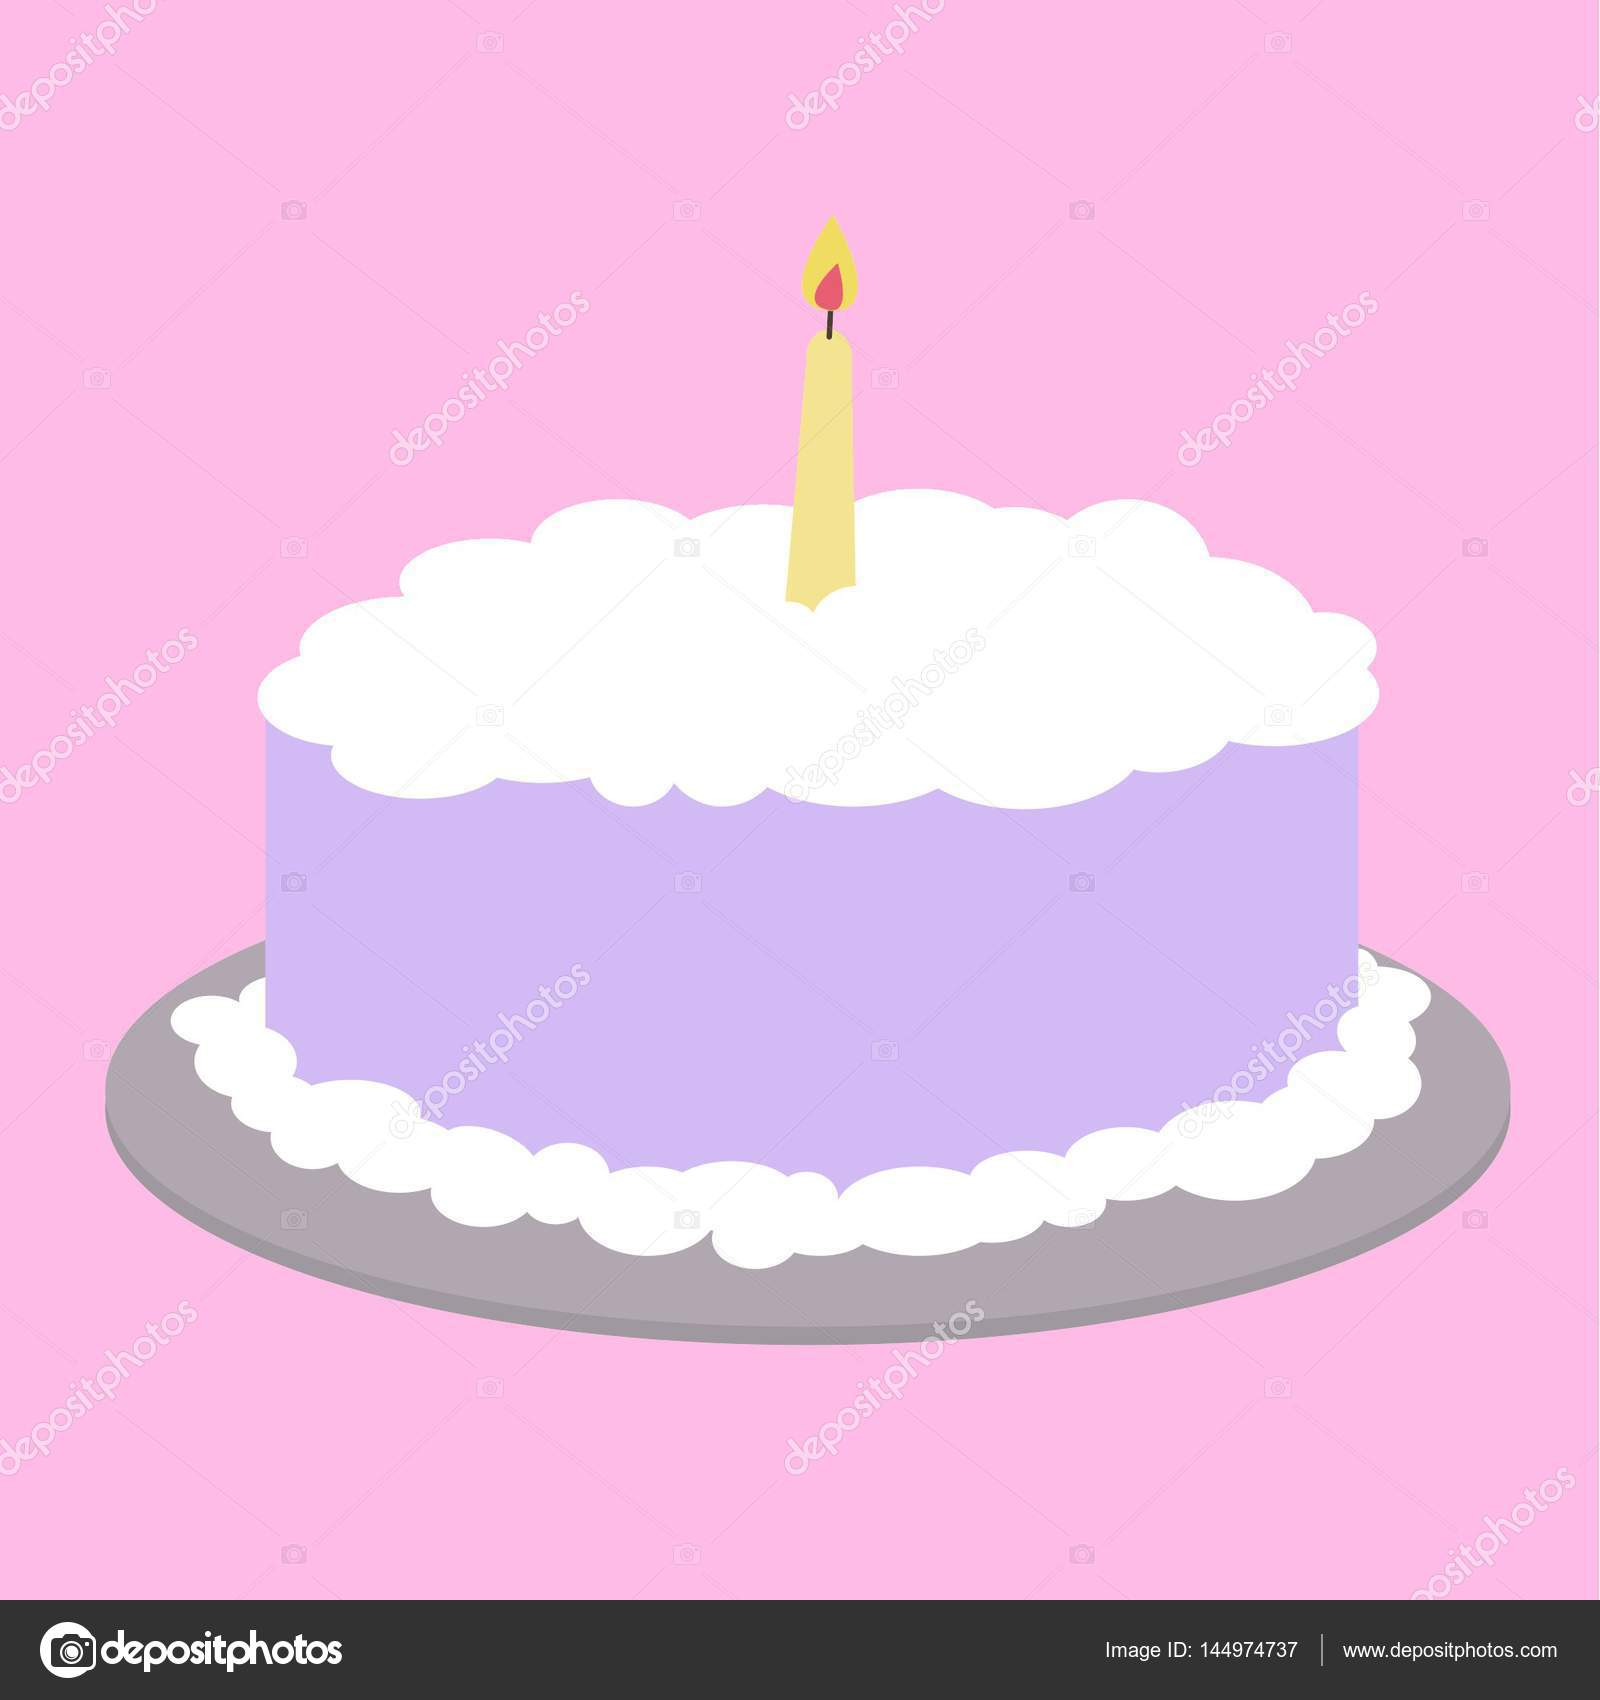 Violette Kuchen Clipart Grafiken Stockfoto Grafff 144974737